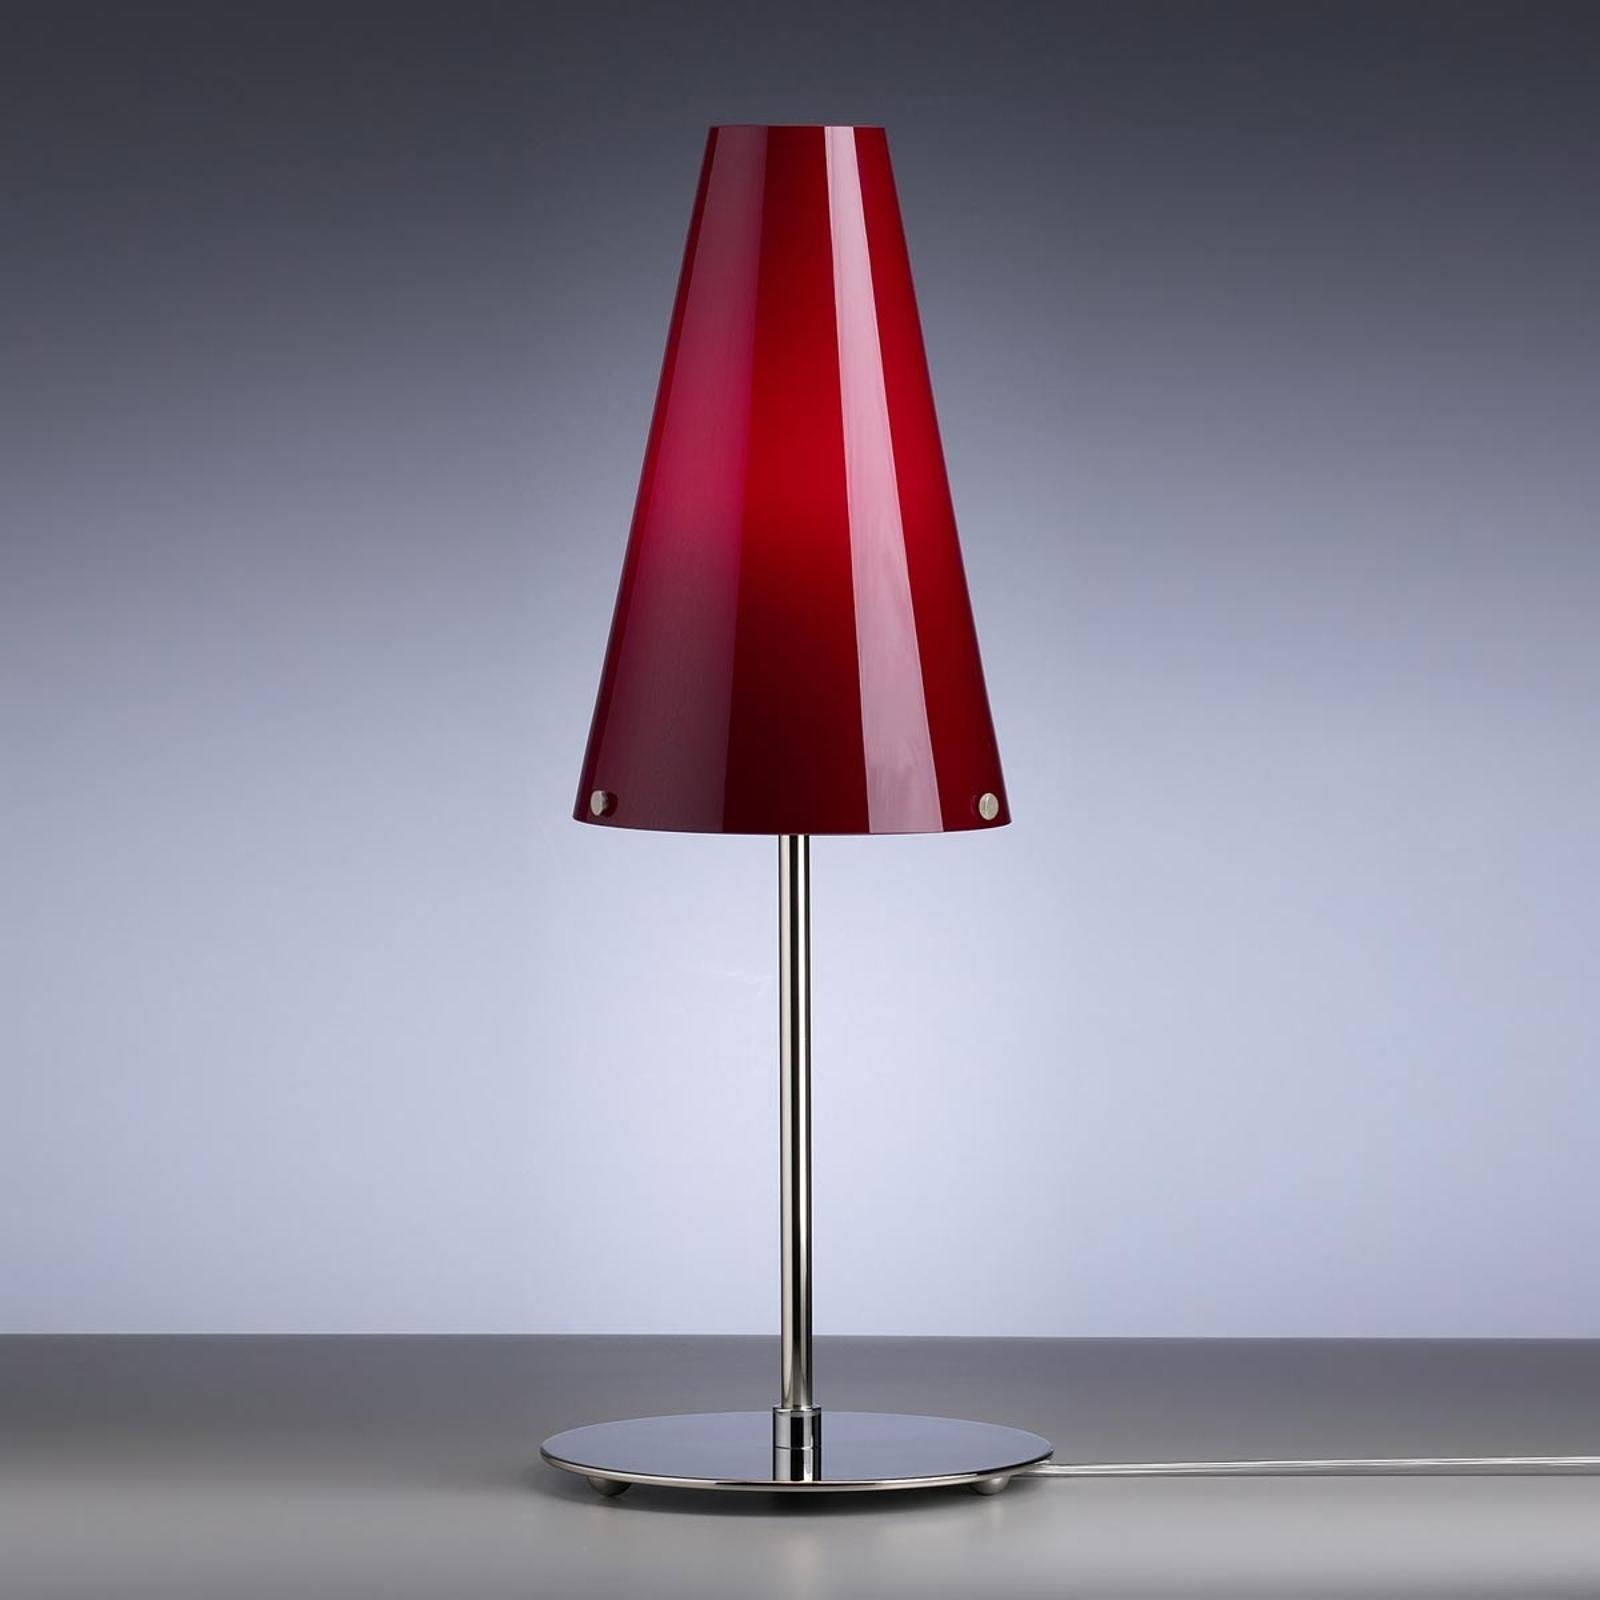 Tafellamp van Walter Schnepel, rood